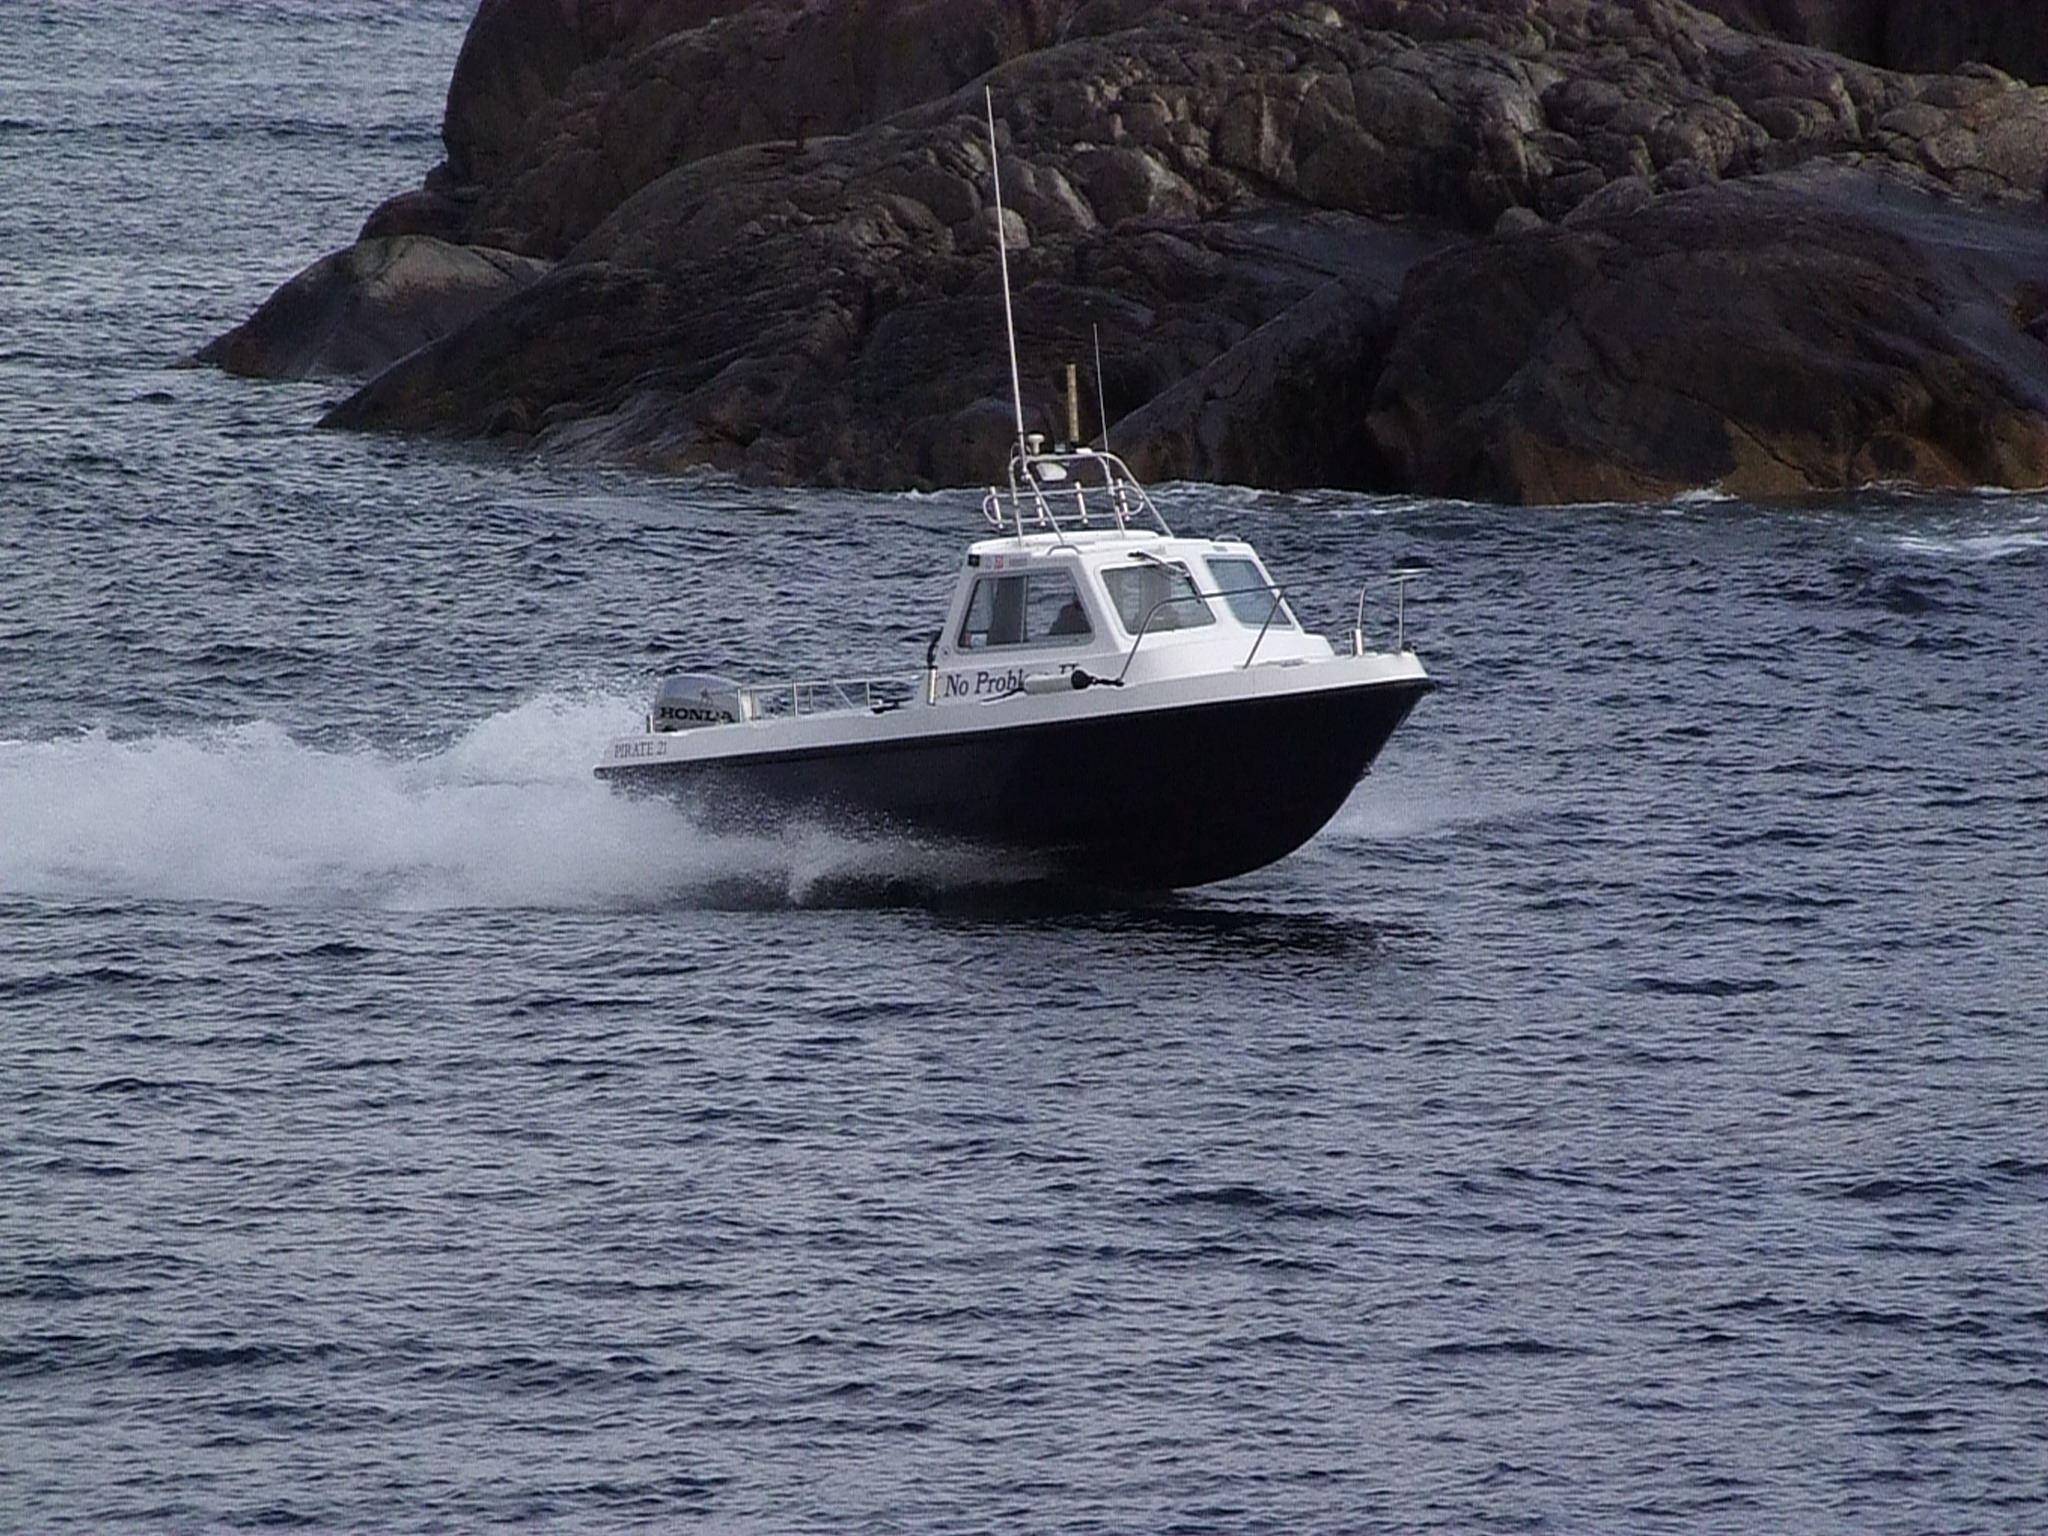 Fishingtrip with a fishing guide - No Problem Fishing